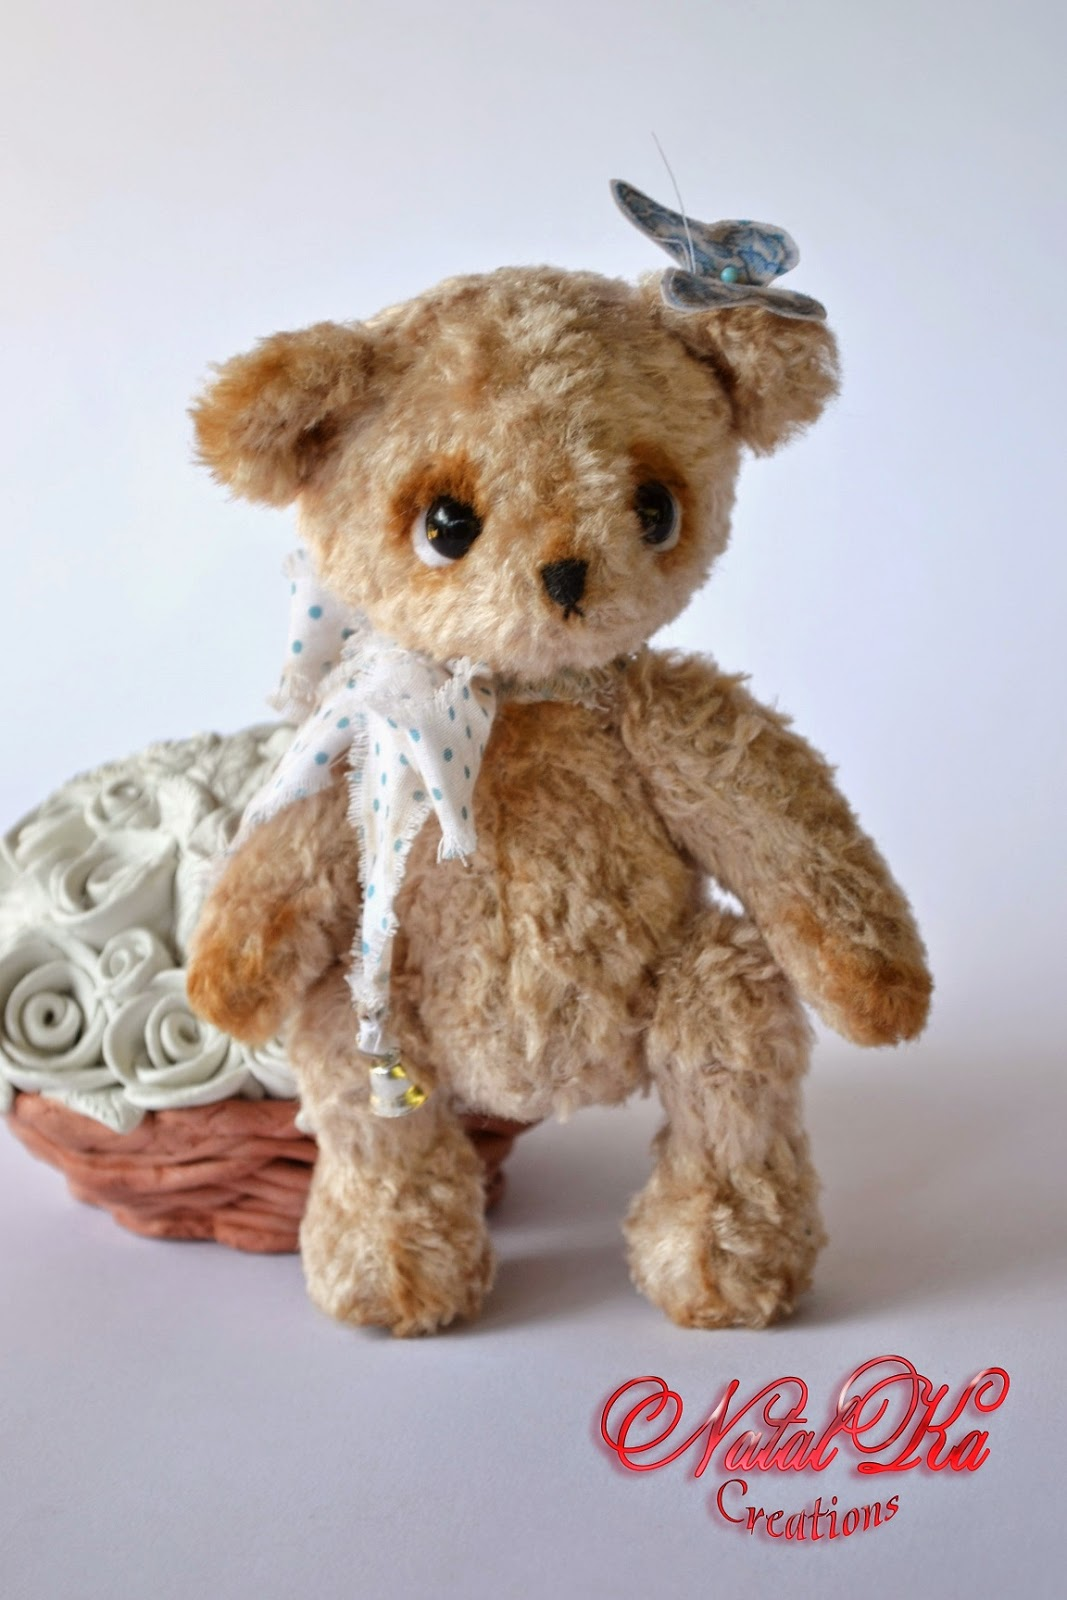 Artist teddy bear handmade by NatalKa Creations. Künstler Teddybär handgemacht von NatalKa Creations.